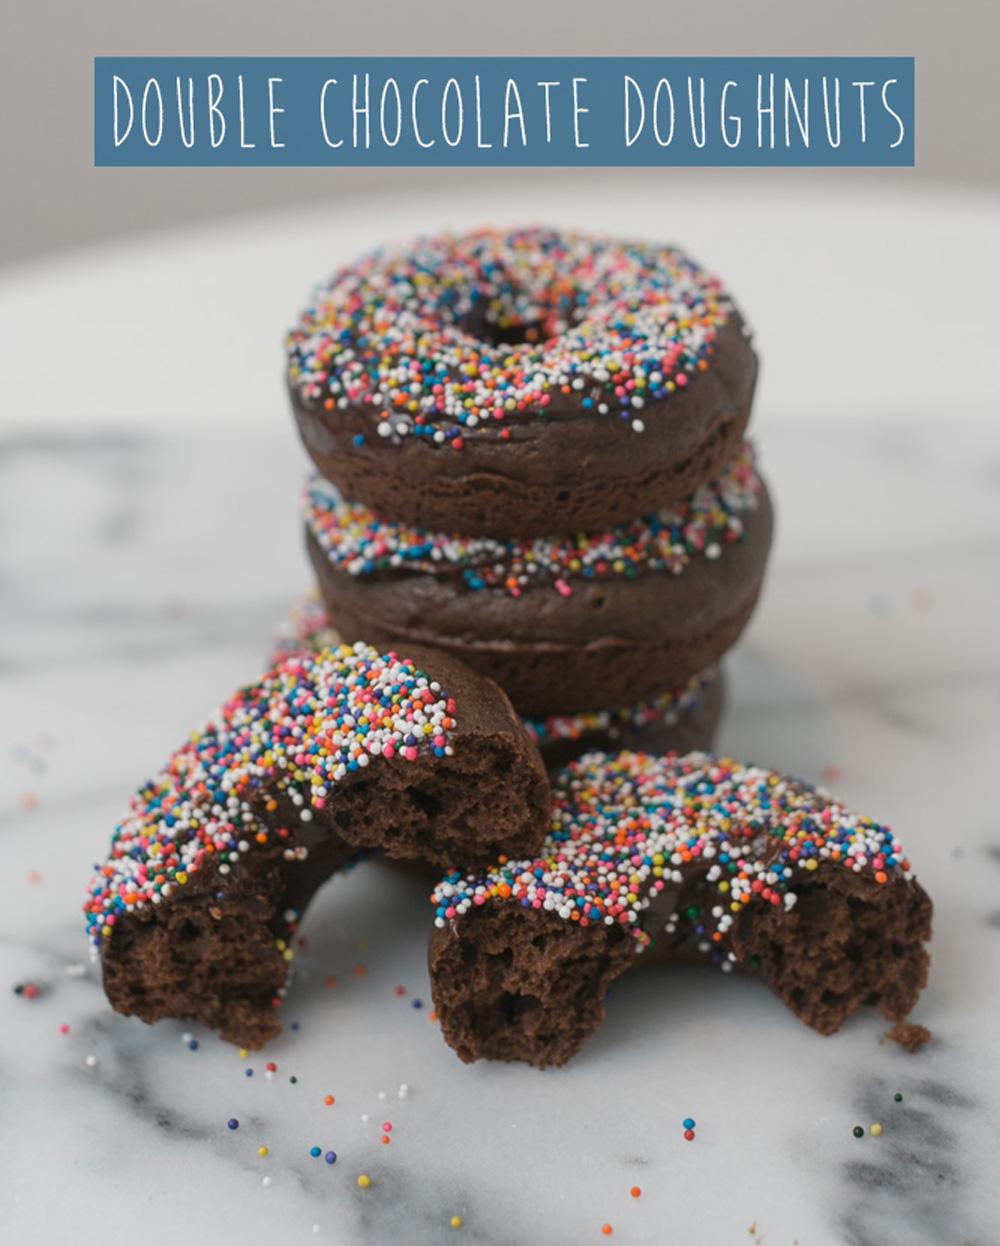 Baked Double Chocolate Doughnuts   Becca Bakes (www.becca-bakes.com)